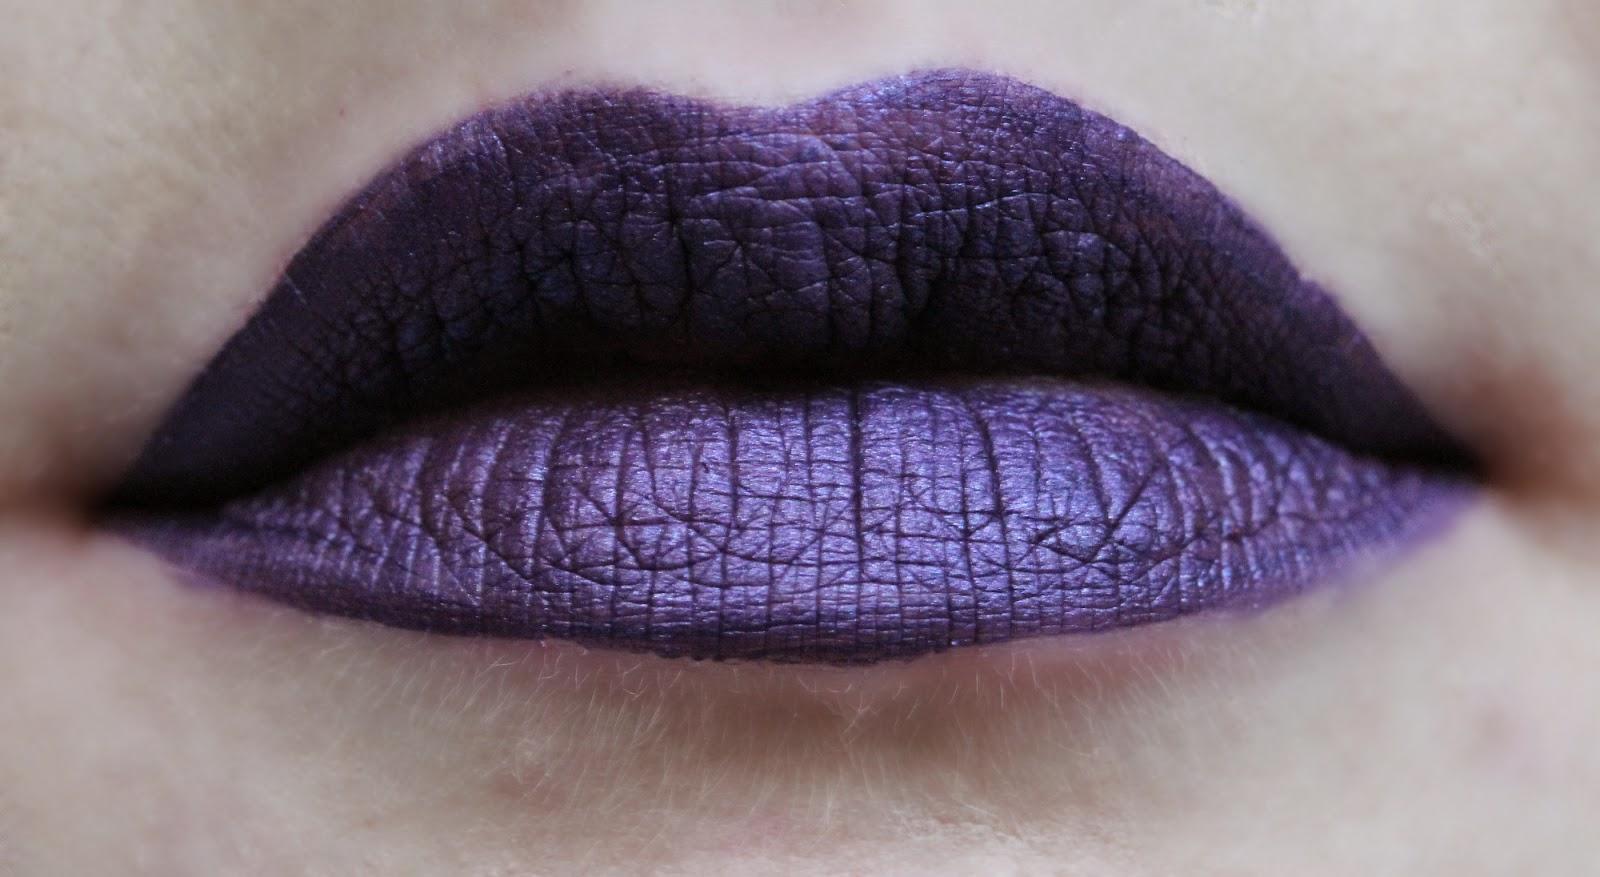 Sephora Cream Lip Stain in Polished Purple